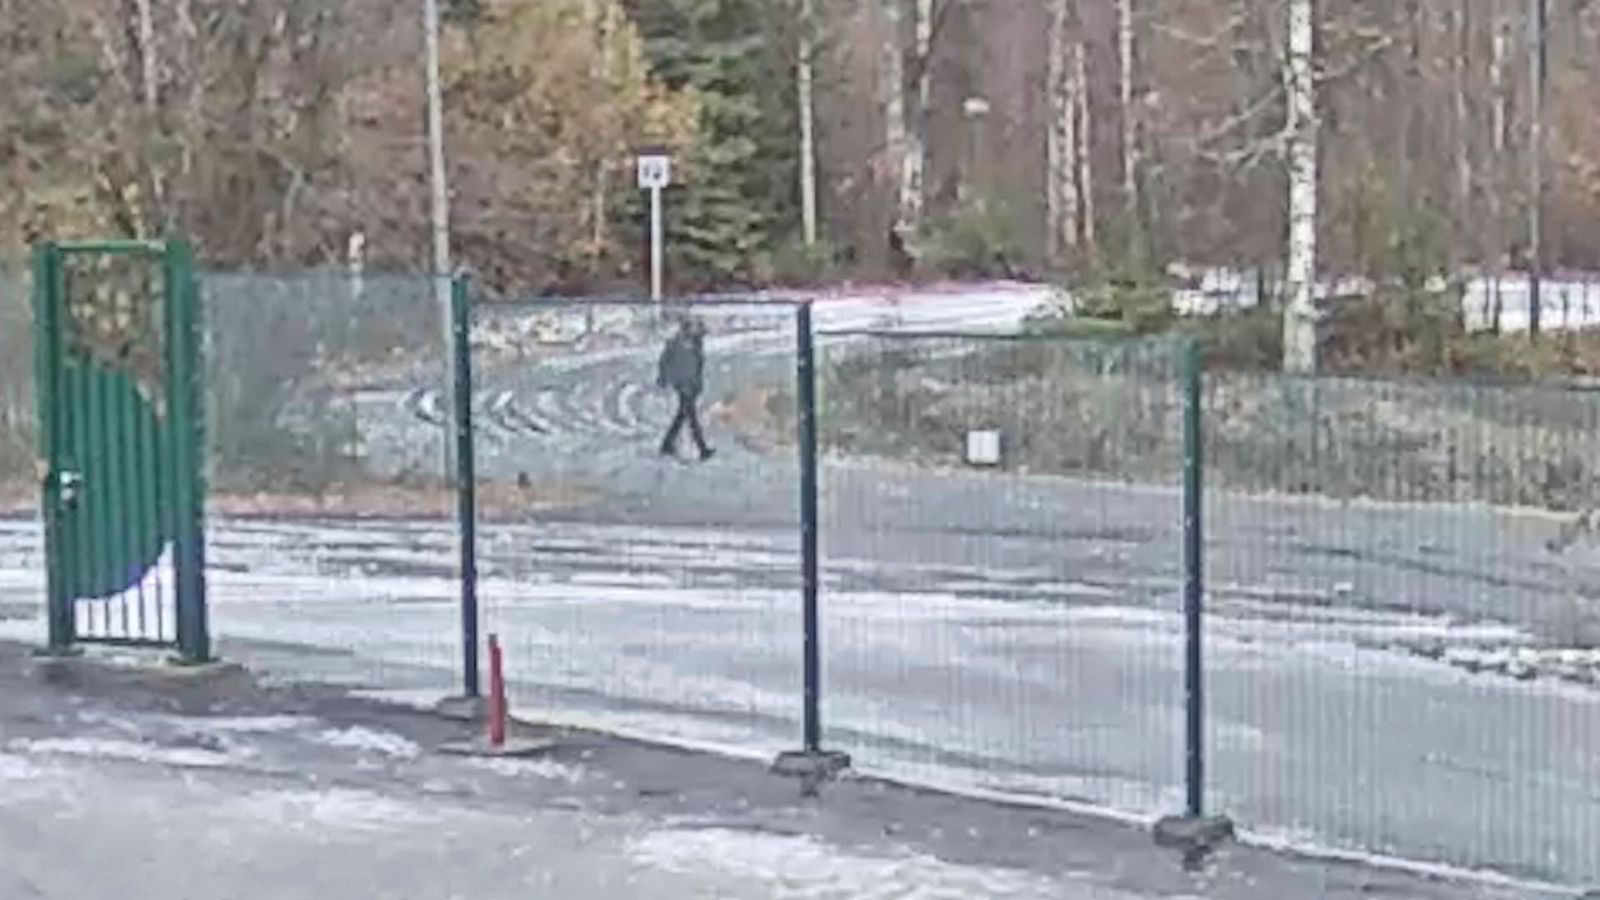 Torsdag friga politiet to vidoer fra et overvåkningskamera på Futurum-bygget i Lørenskog – der Tom Hagen har kontorer. Filmen viser personer utenfor bygget tidlig samme morgen som Anne-Elisabeth F. Hagen forsvant.